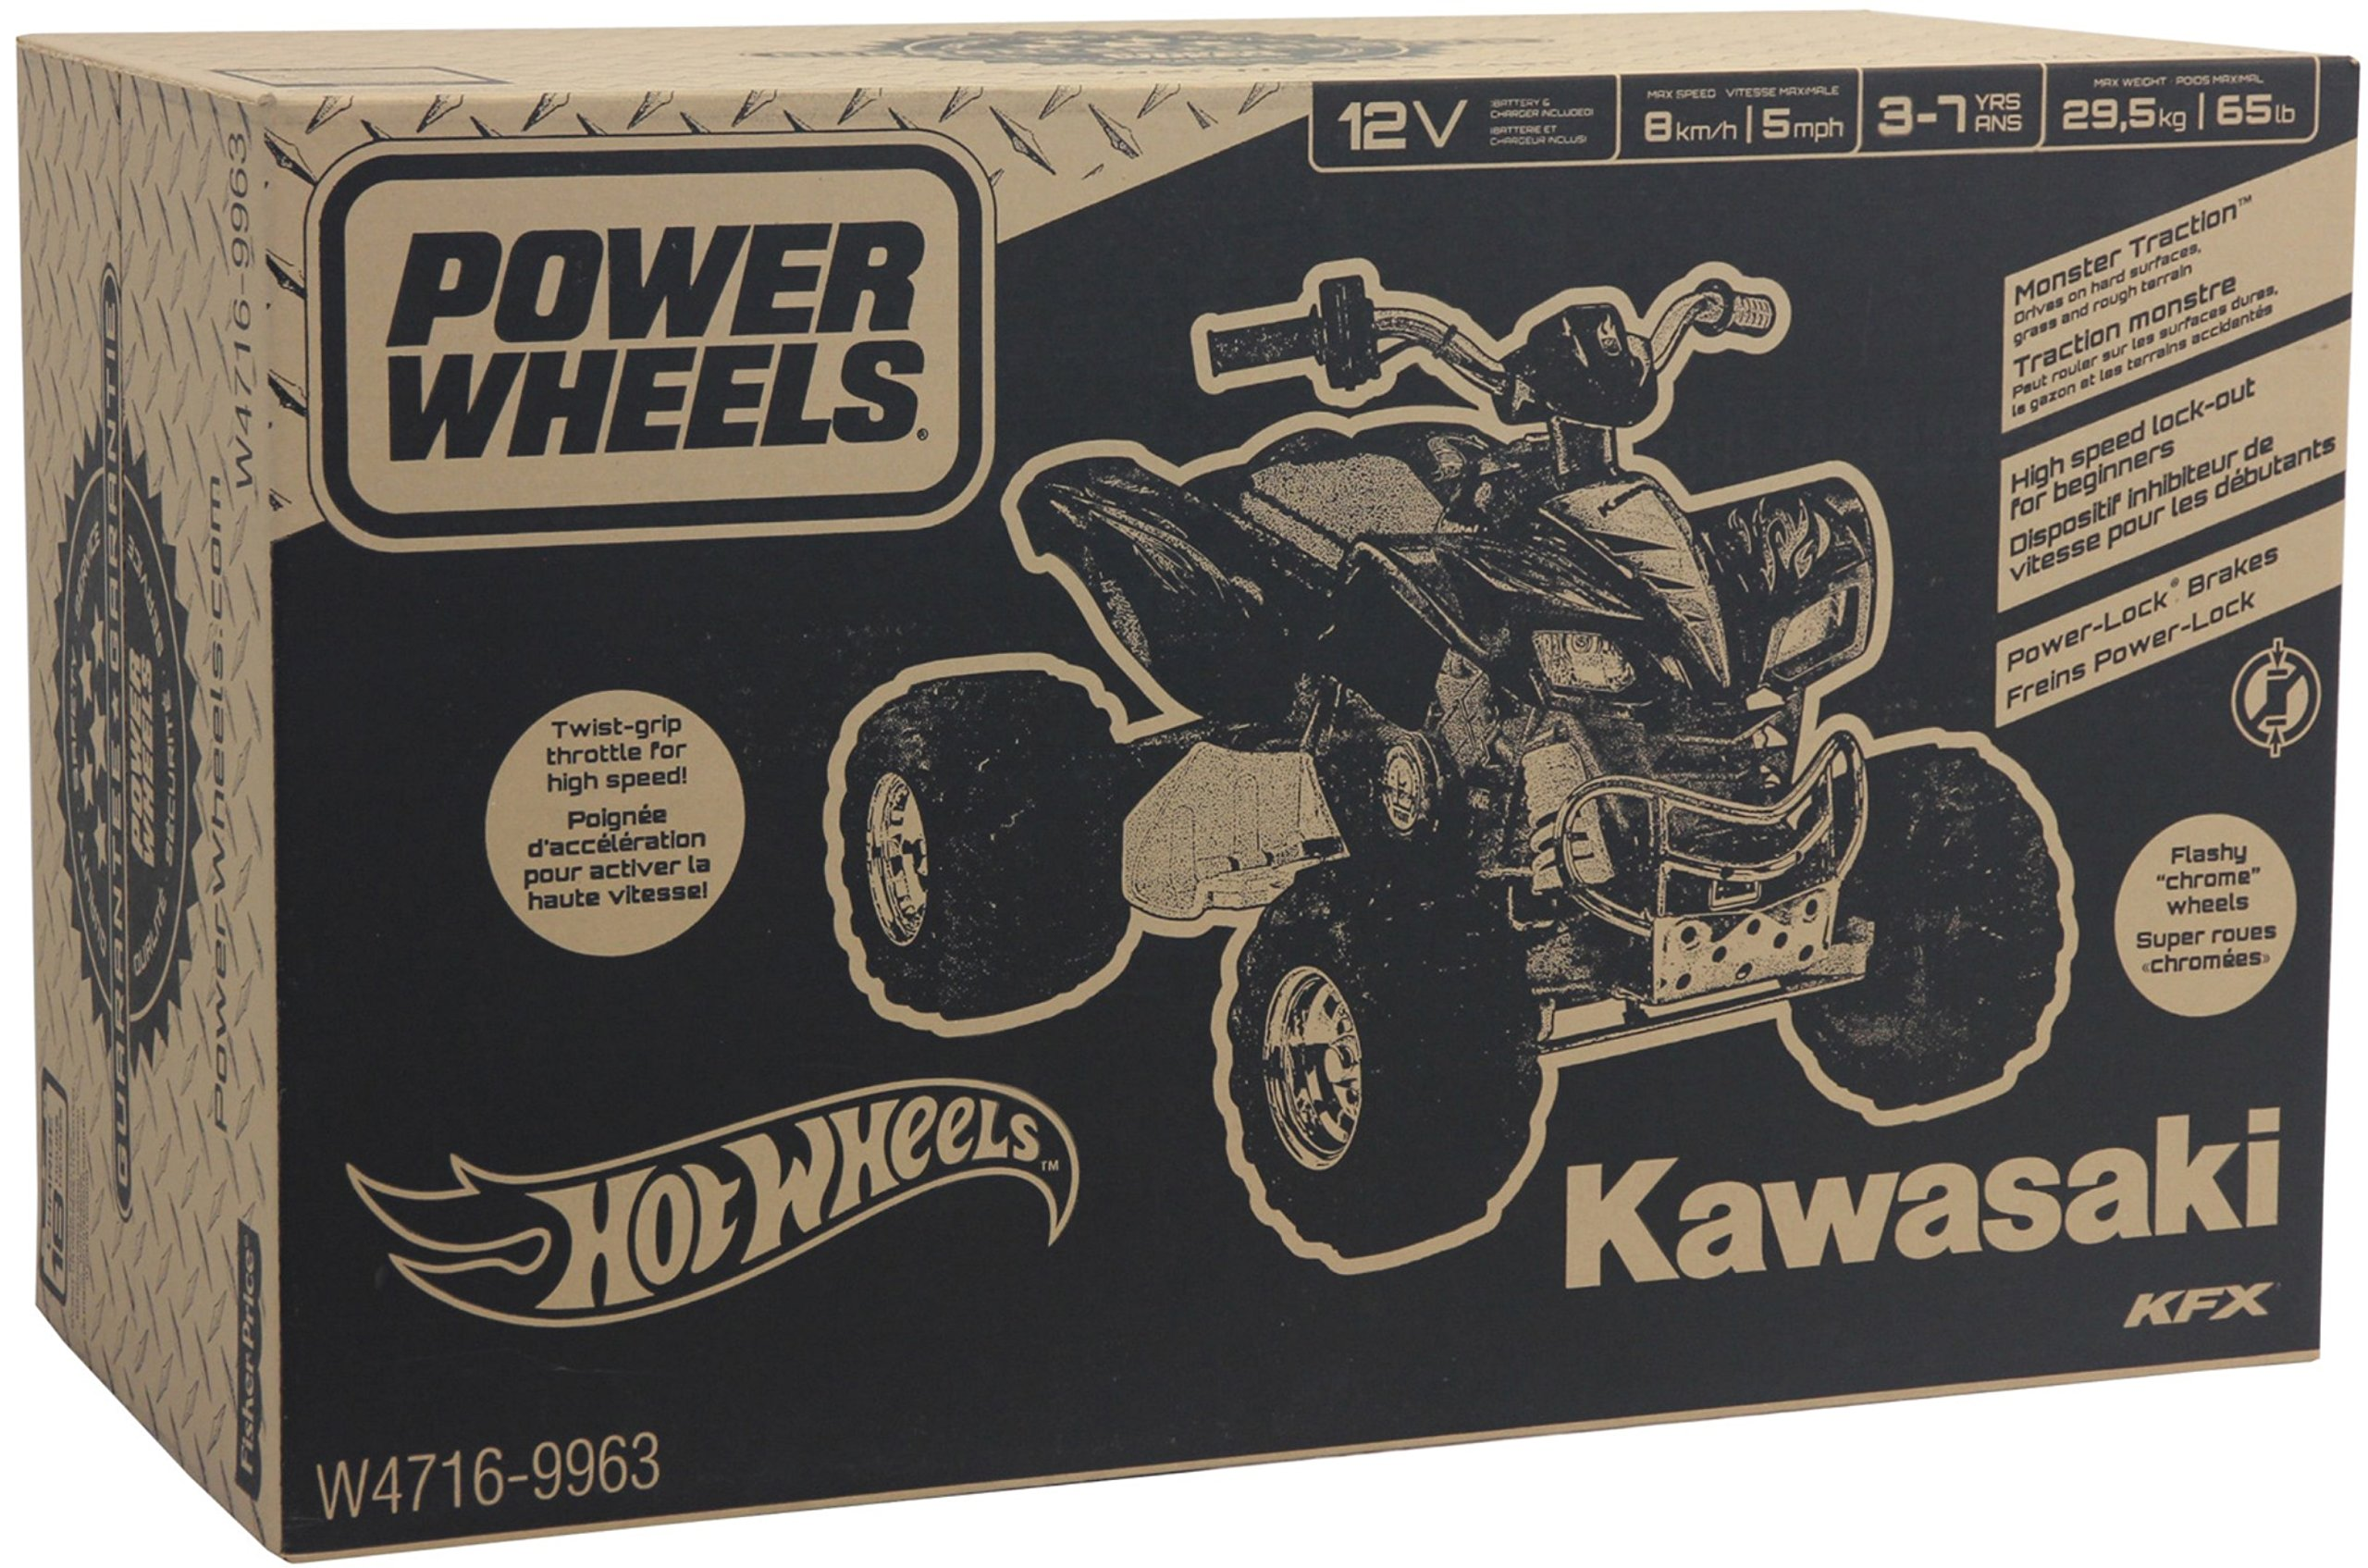 Power Wheels Hot Wheels Kawasaki KFX by Fisher-Price (Image #10)